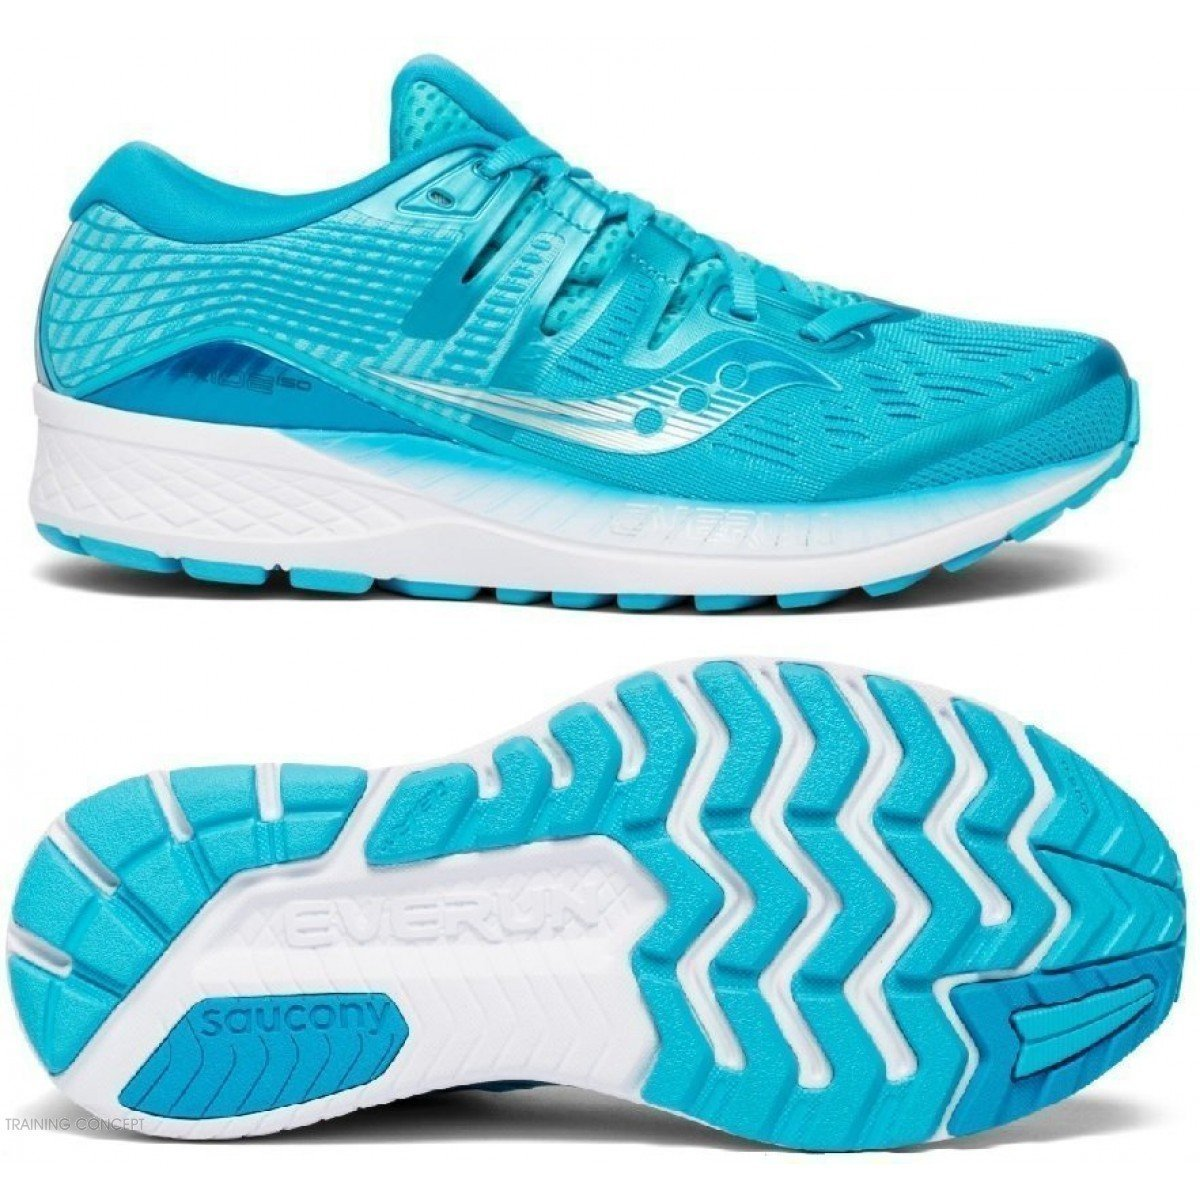 Blue 3 Femmes Running Pour S10444 De Chaussure Saucony Iso Ride EWH2DI9